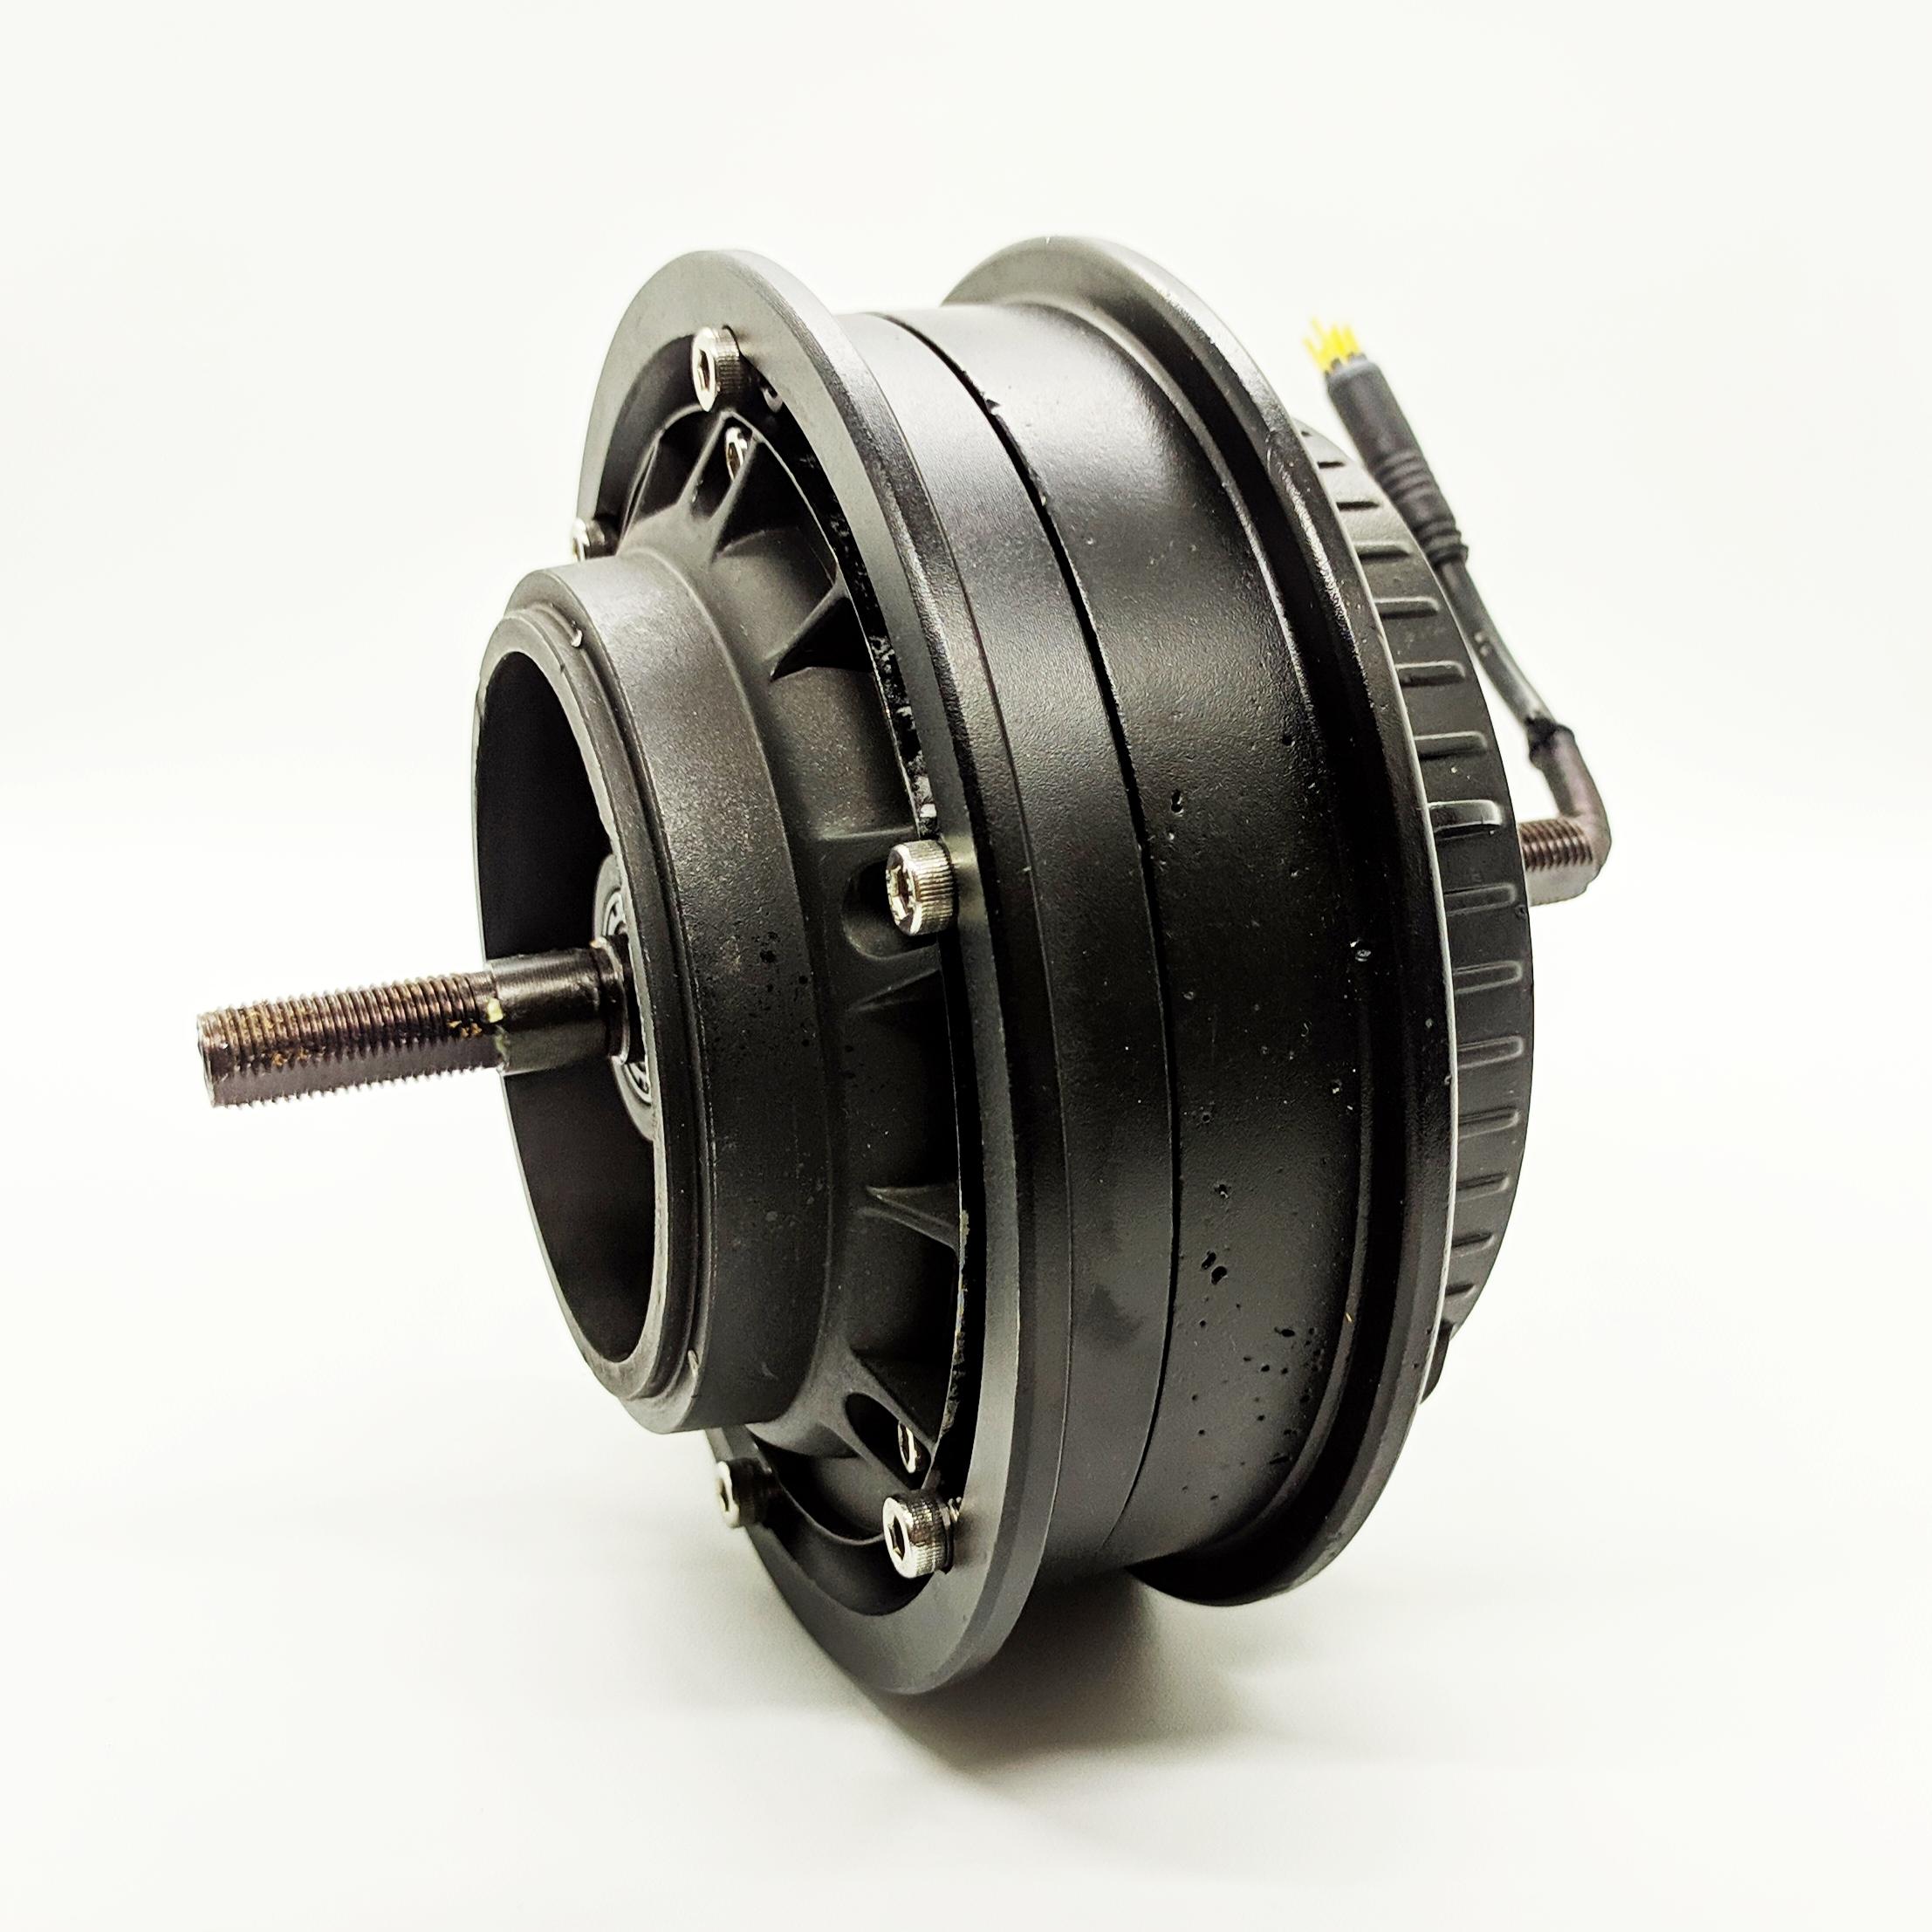 IMG 20200416 161401 - Anoa Ex+ 1000W Motor